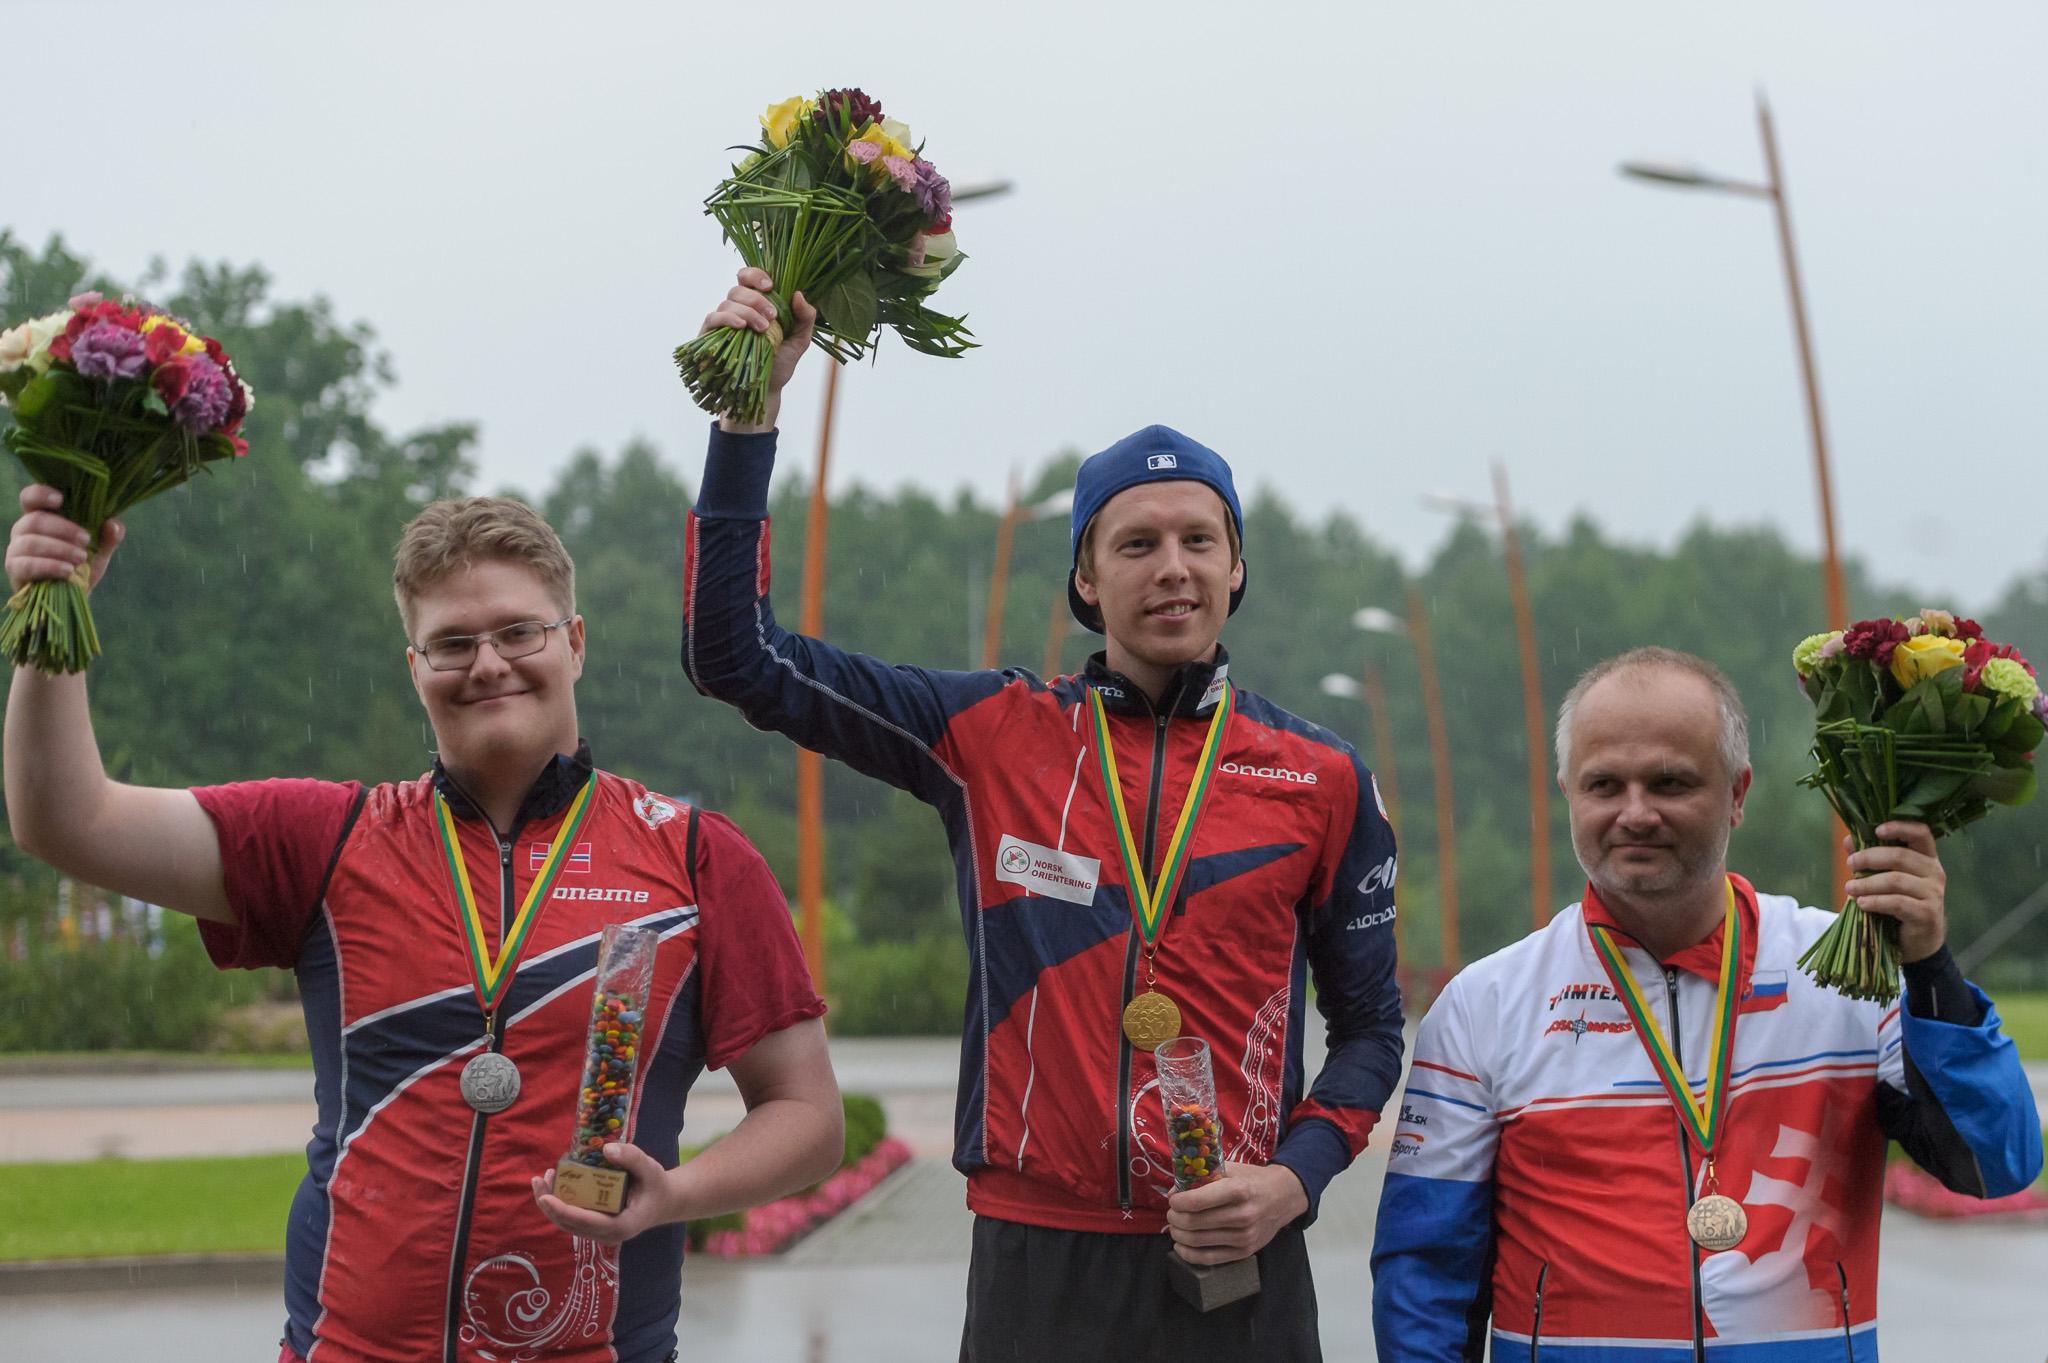 Pasaulio Trail-O čempionai. Iš kairės: norvegas Martin Aarholt Waaler, norvegas Vetle Ruud Bråten ir slovakas Ján Furucz